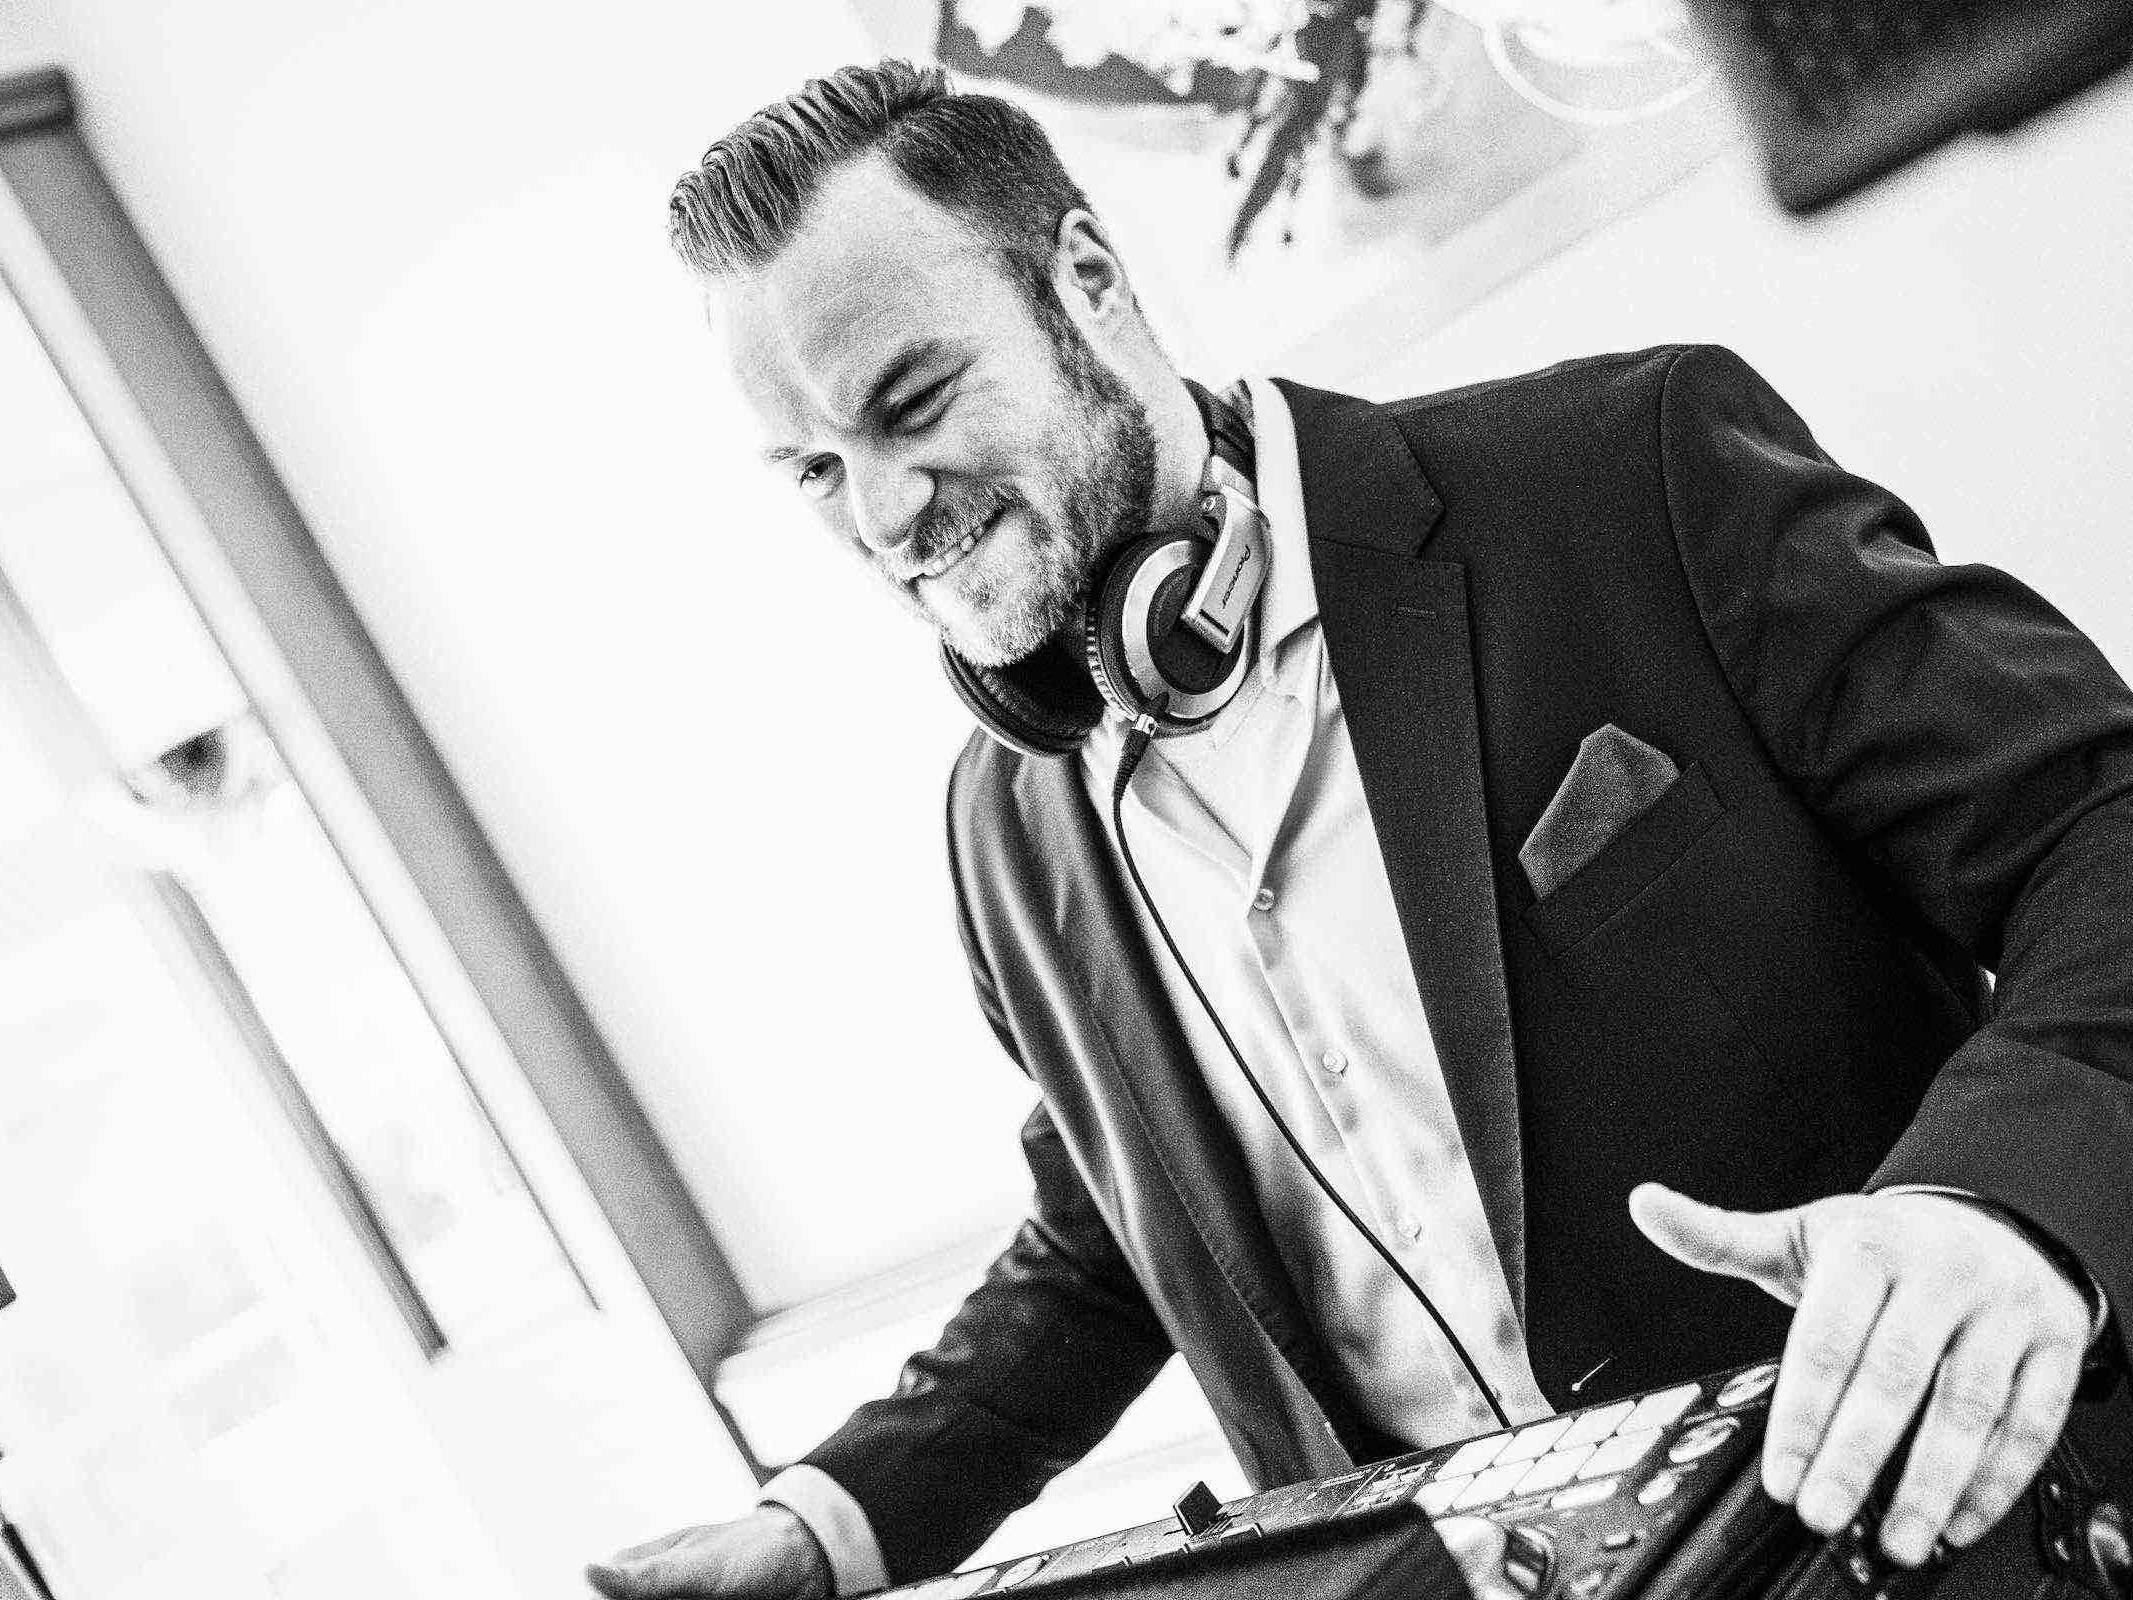 DJ | Hamburg | Buchen | Discjockey | Nils | DJ | Firmenfeier | Messe | DJ | Event | DJ | Geburtstag | DJ | Service | DJ | Kosten | DJ | Mieten | DJ | Anfragen | DJ | Agentur | Hamburgfeiert